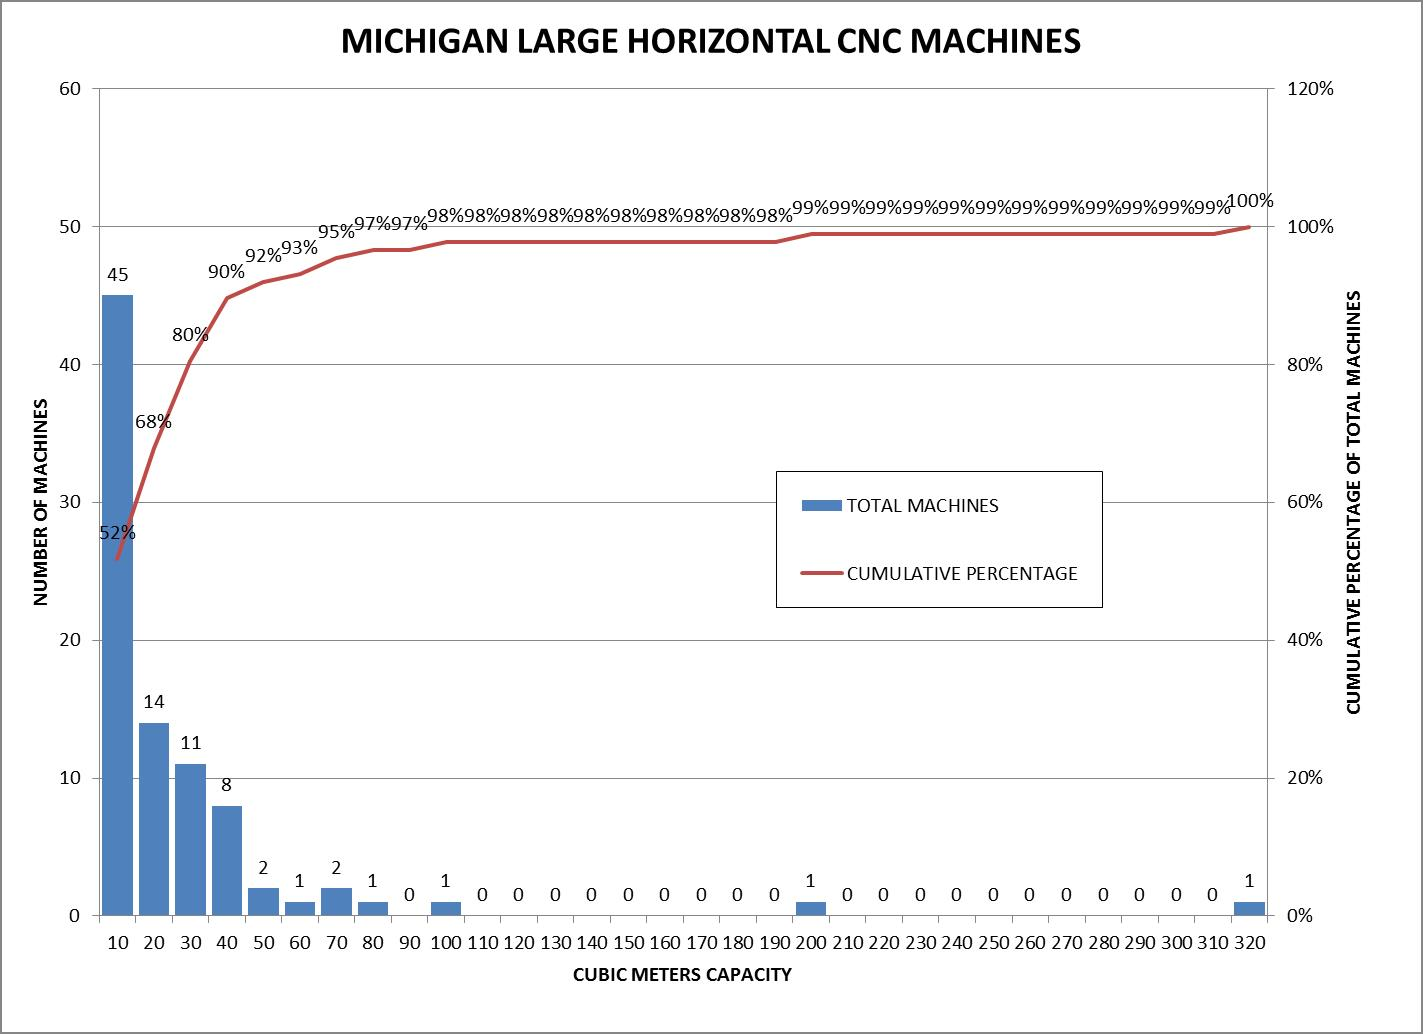 Michigan Large Horizontal CNC Machines Histogram